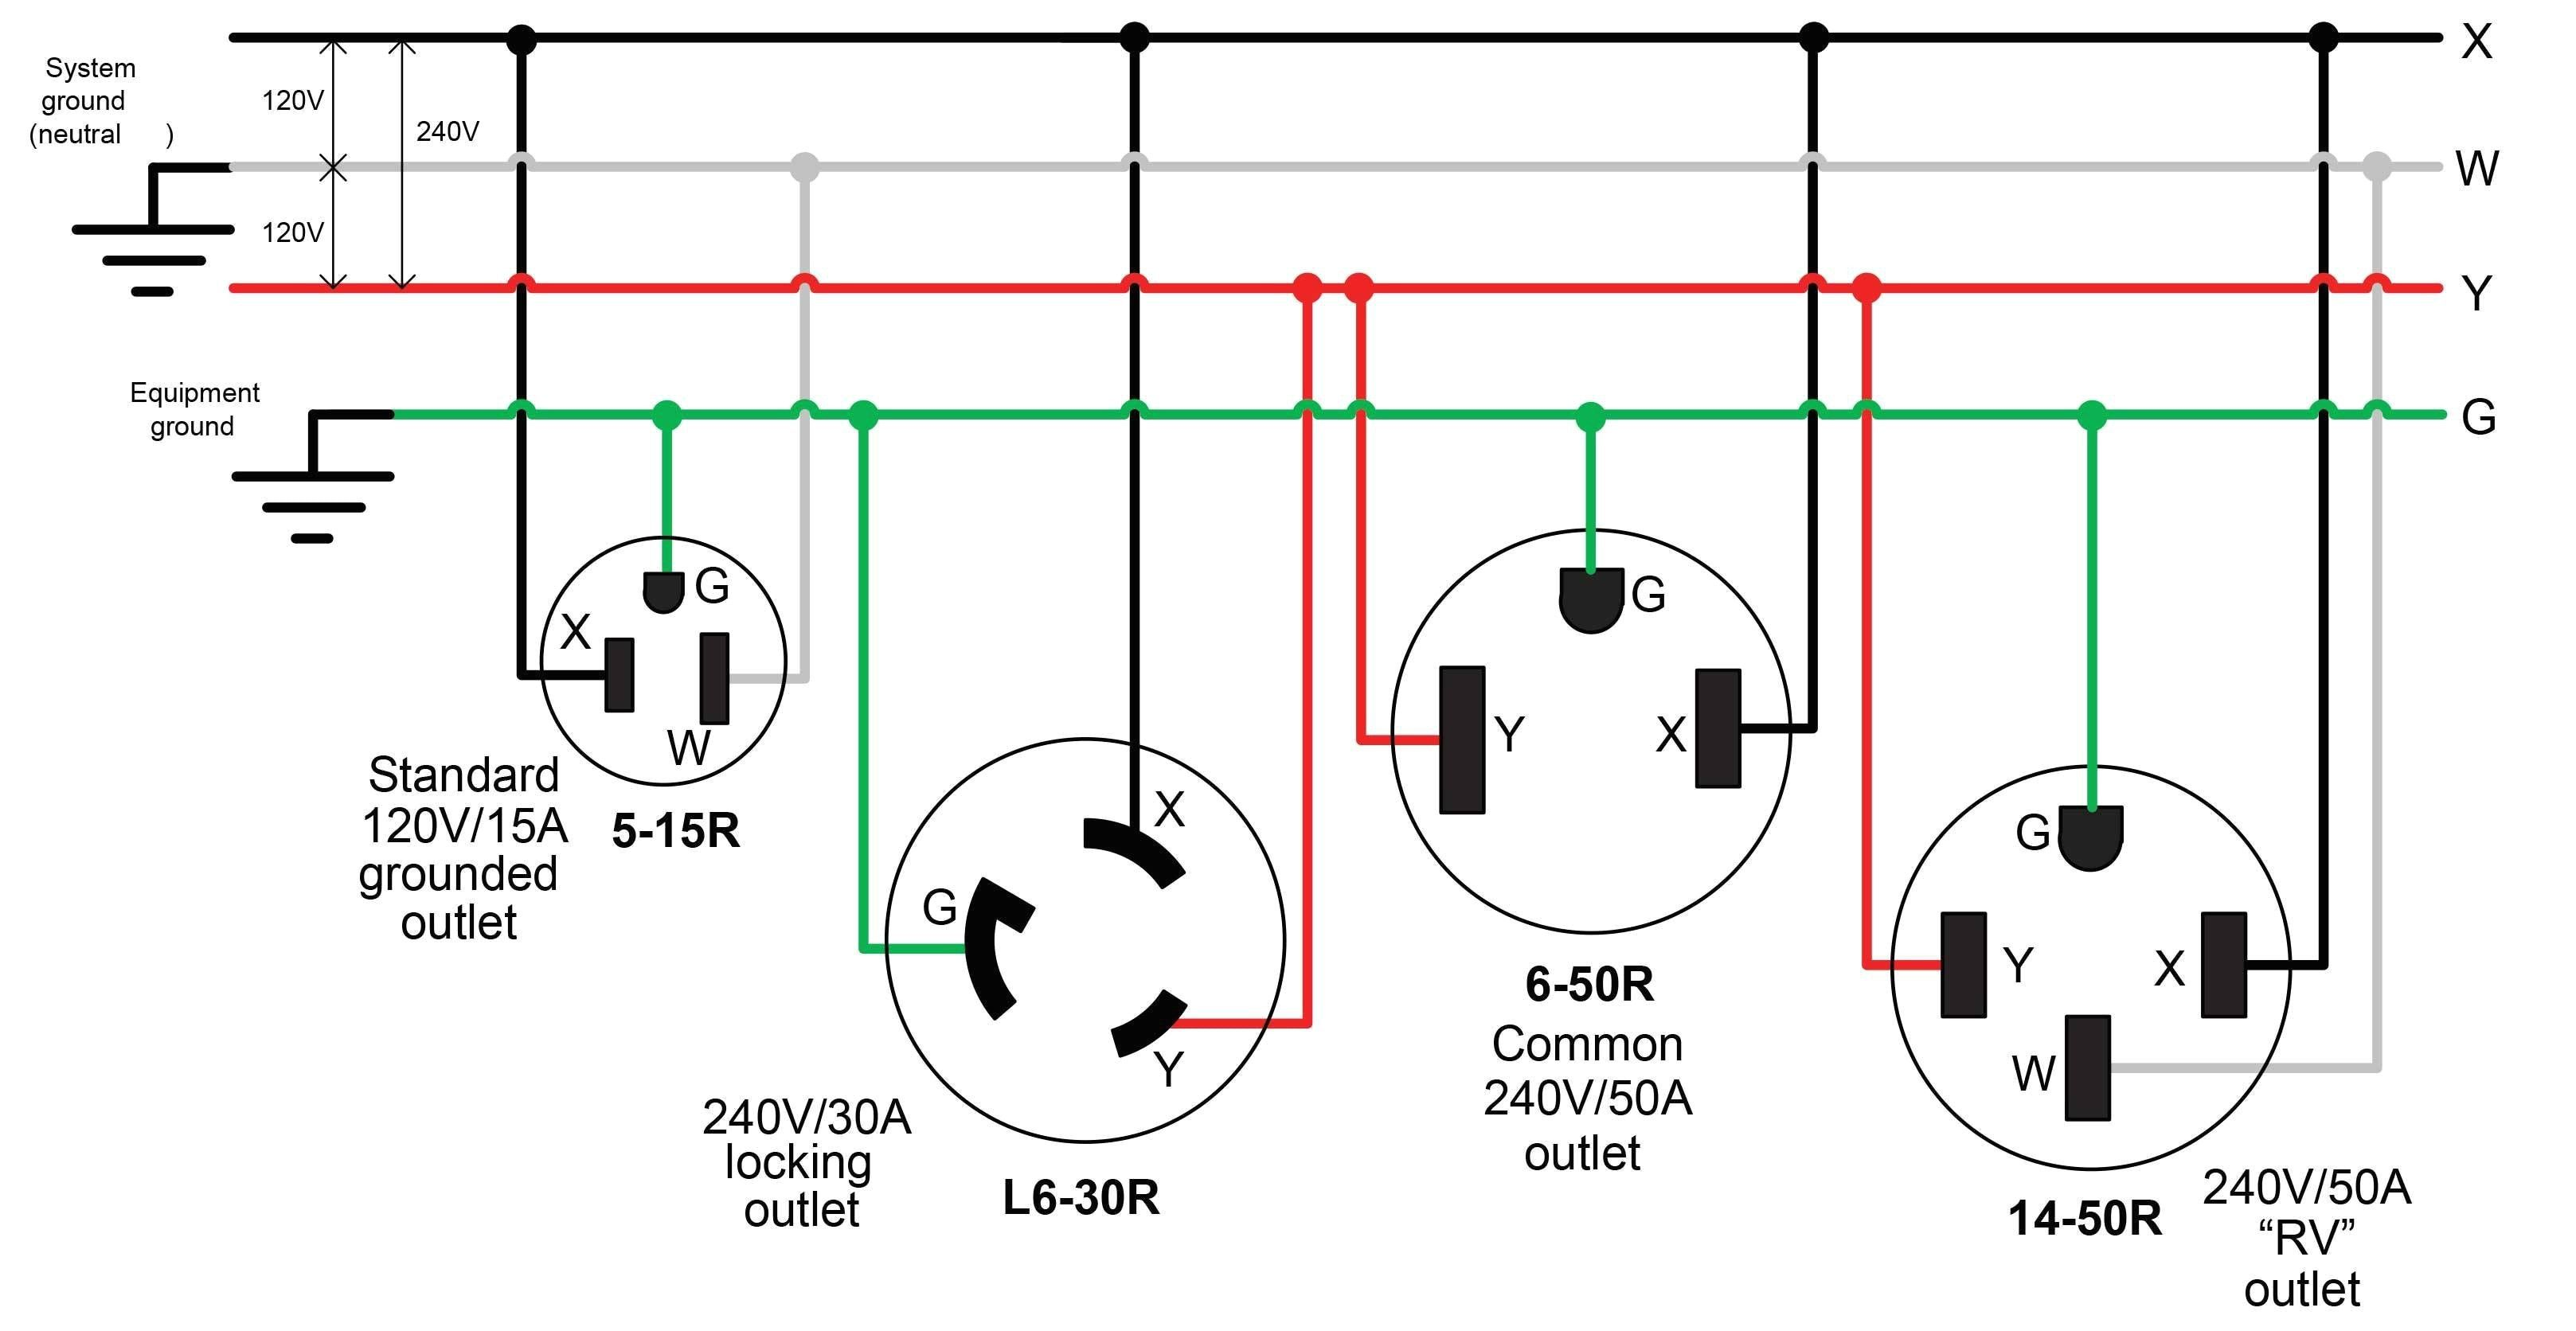 230v generator wiring diagram narva single phase receptacle odnscm danielaharde de rh 68 malibustixx